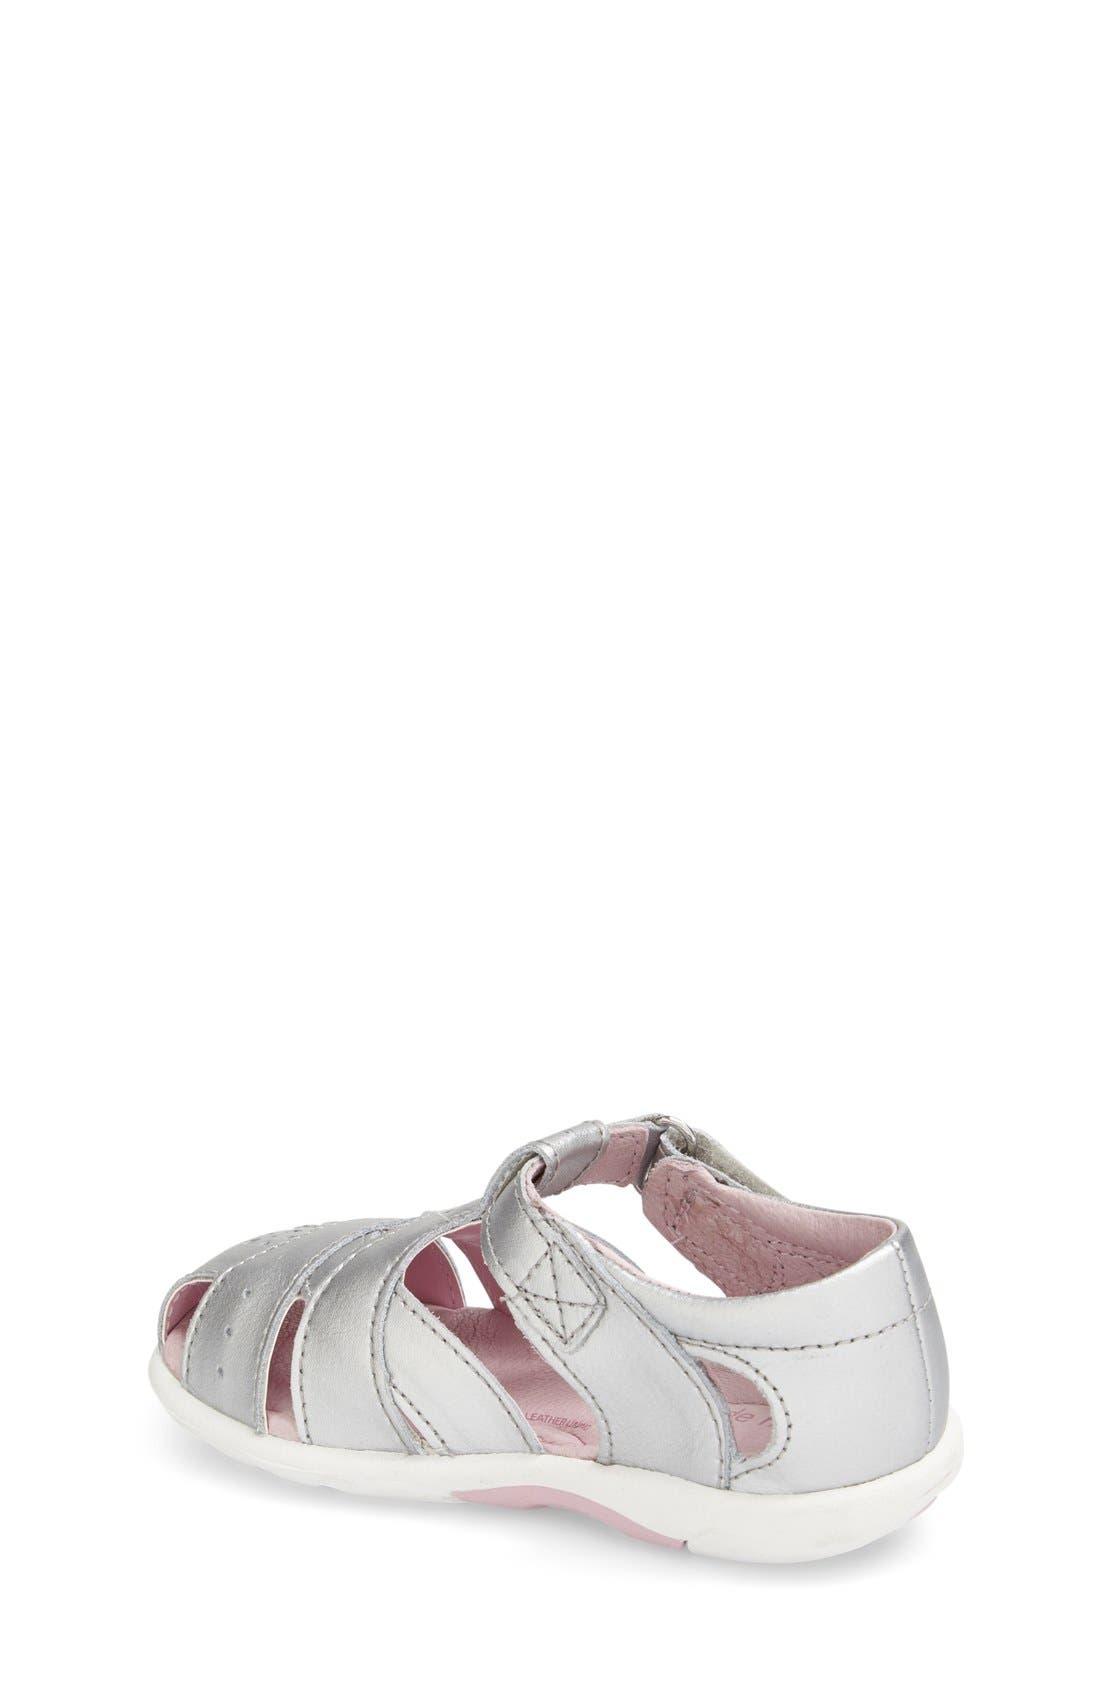 Alternate Image 2  - Stride Rite 'Tulip' Sandal (Baby, Walker & Toddler)